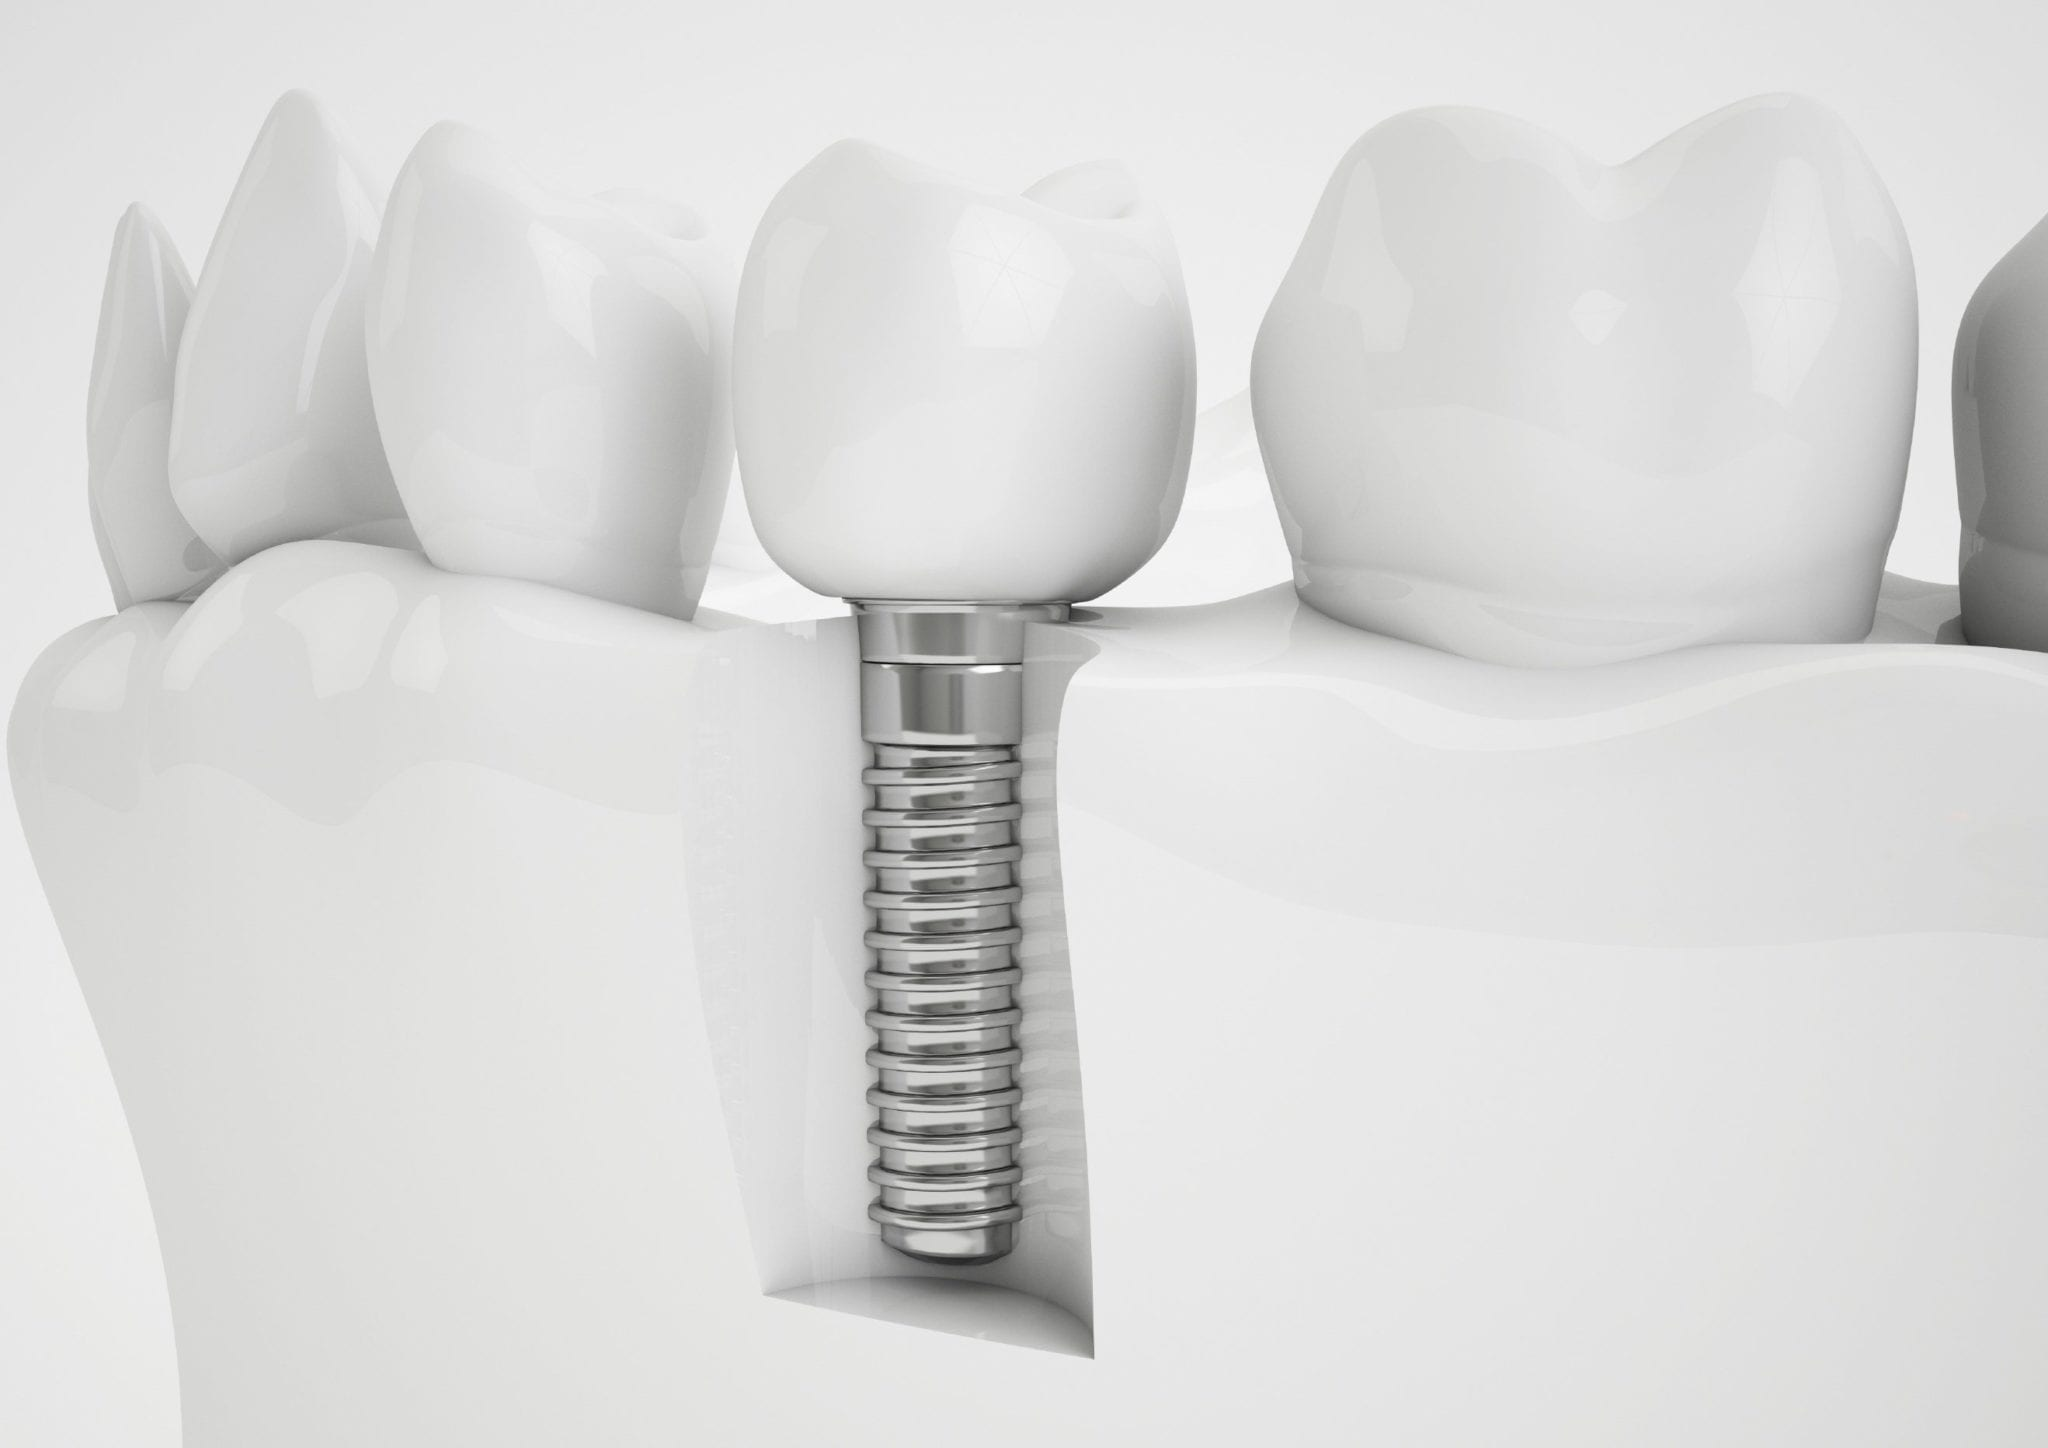 32-Pearls-Seattle-Dentist-Dental-Implants